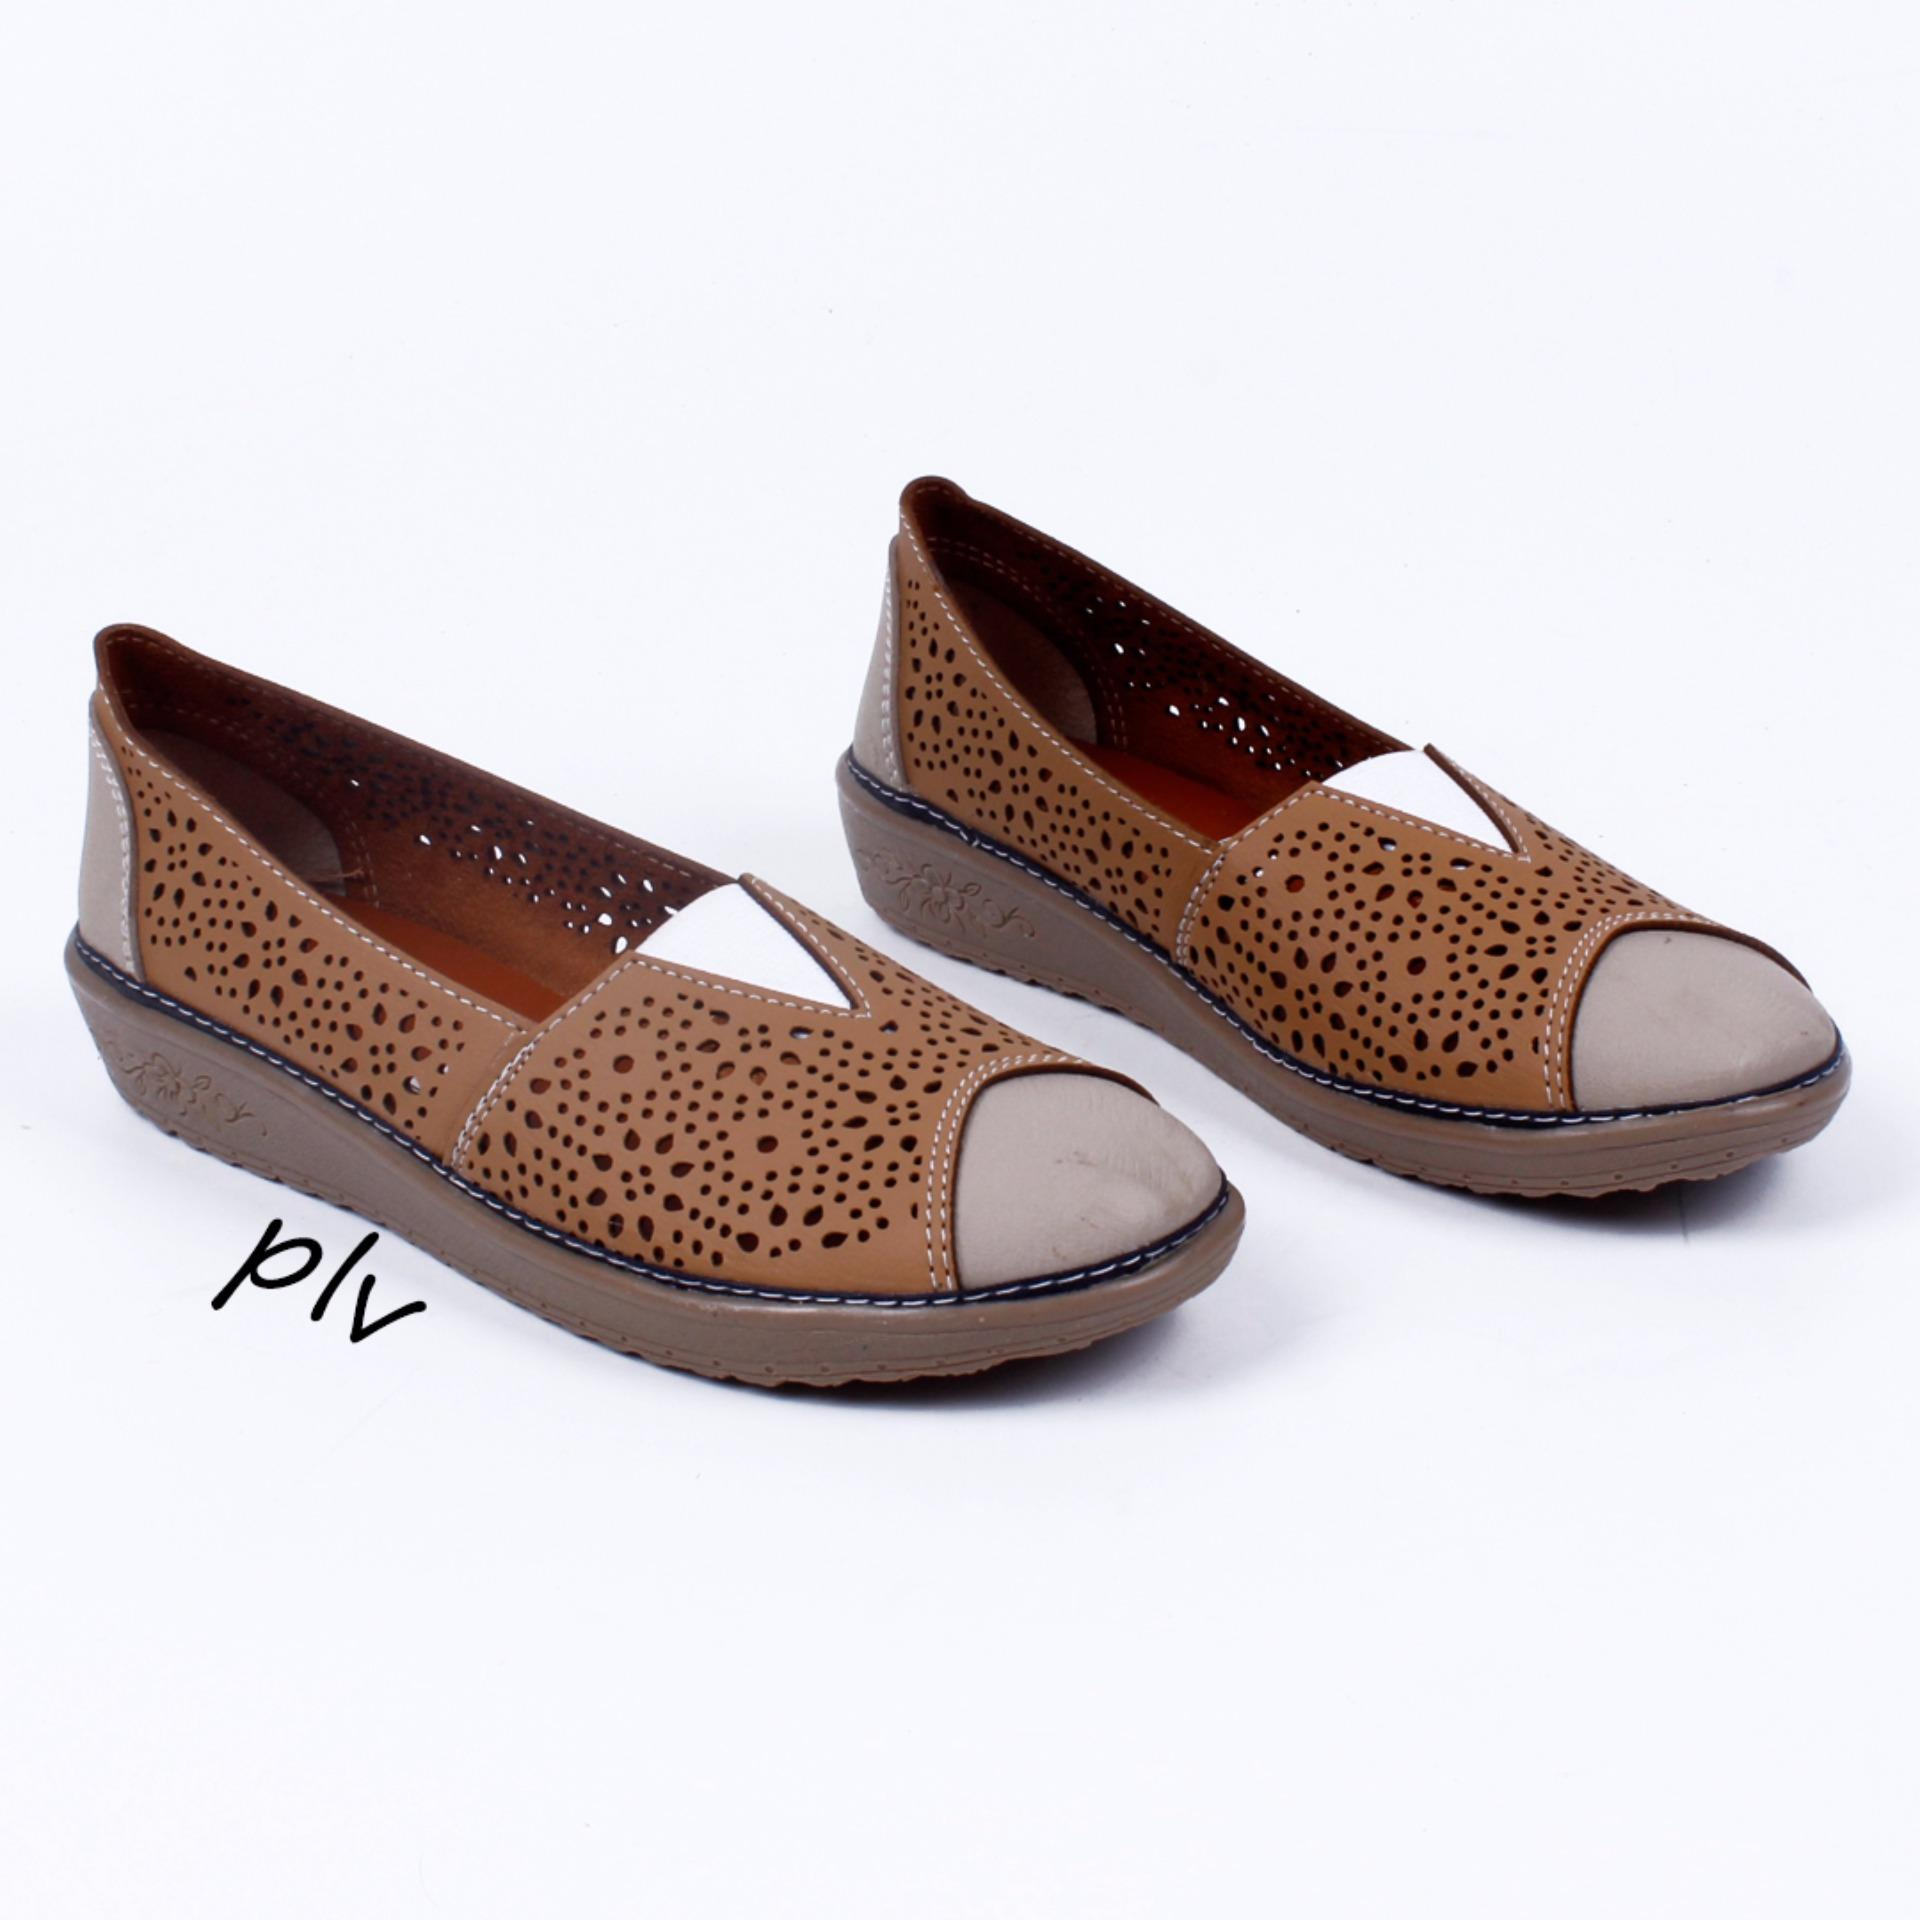 Harga Grivera Sepatu Wanita Flat Shoes Laser My88 Tan Grivera Shoes